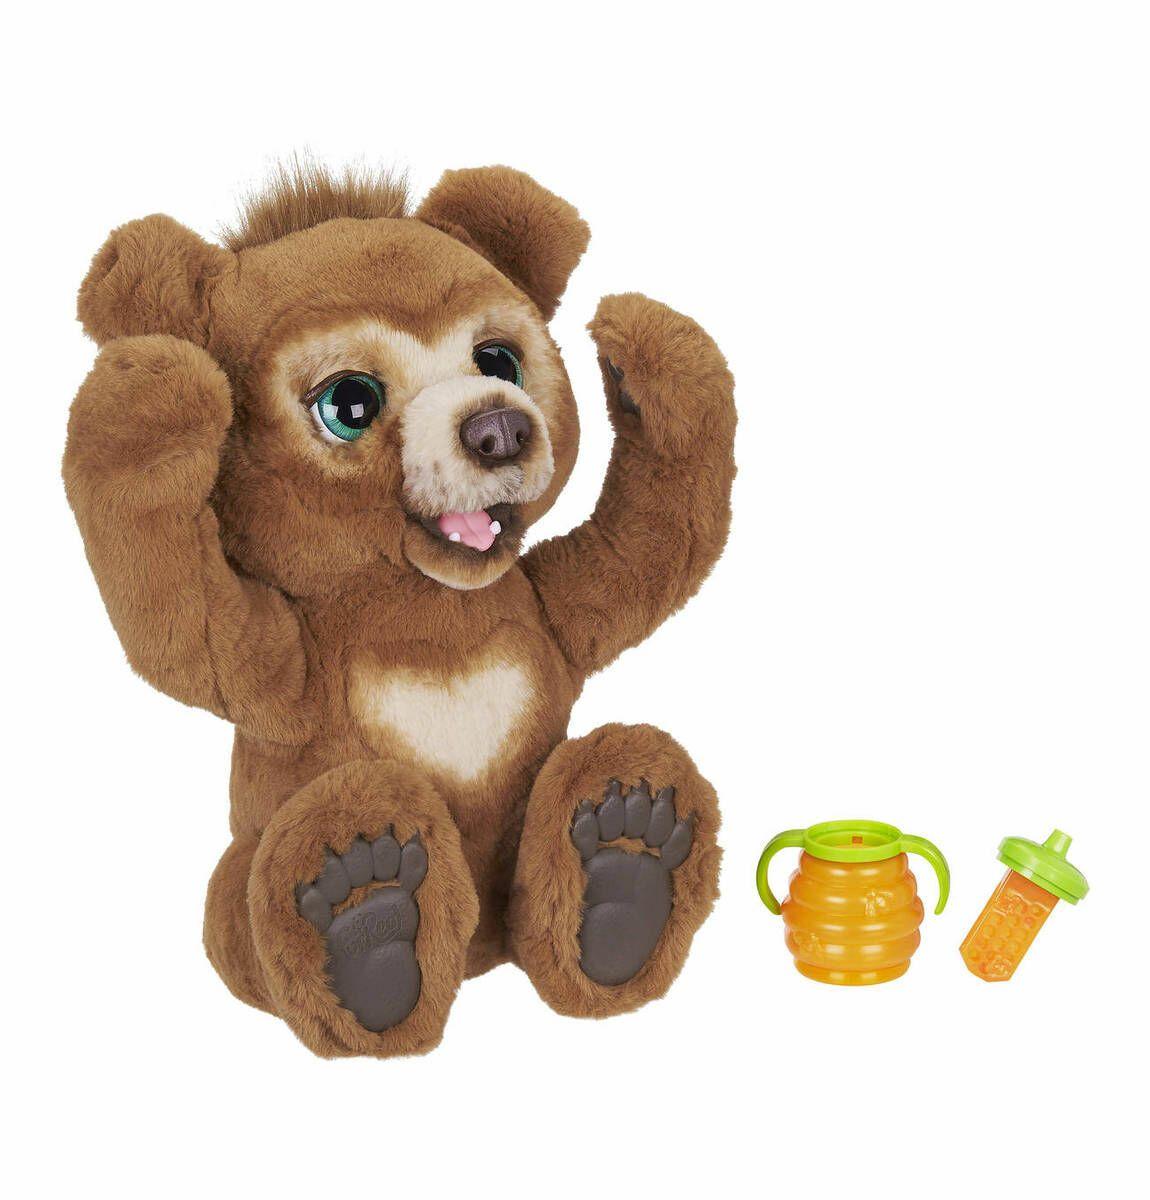 [Mit Kundenkarte] Hasbro FurReal Friends Cubby Interaktiver Teddybär